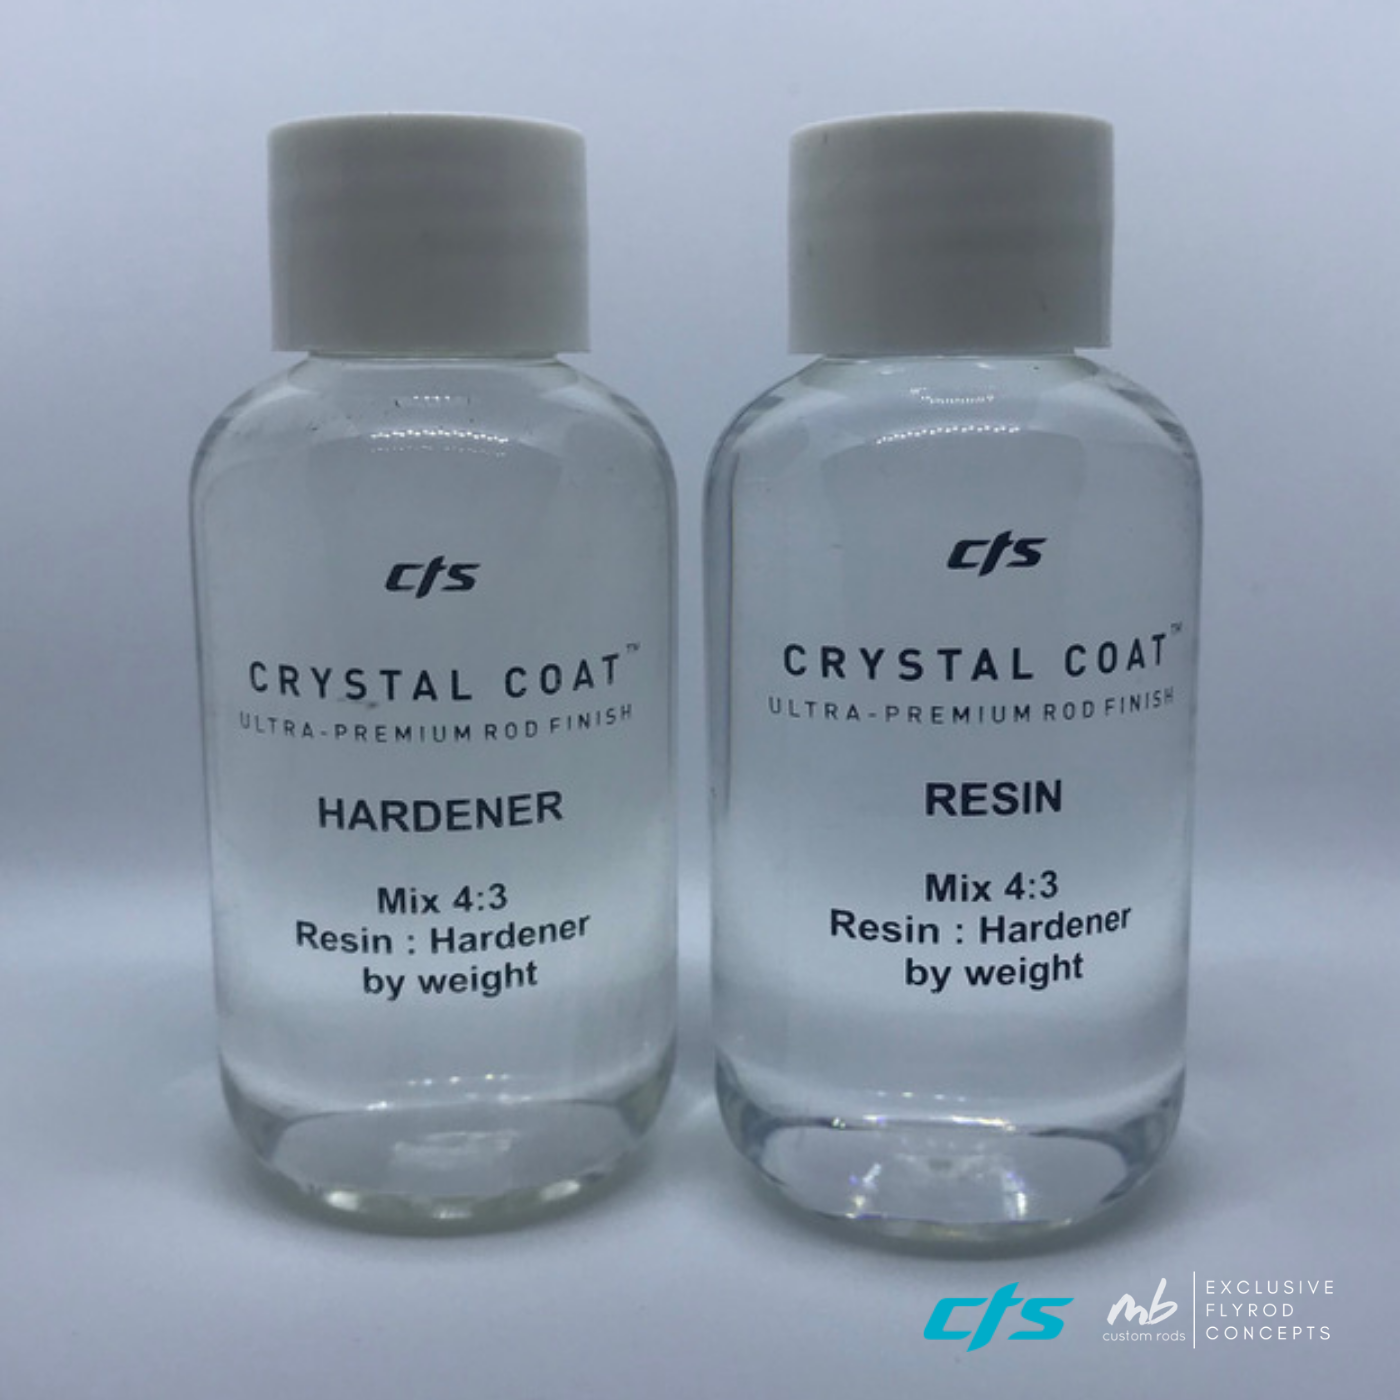 CTS - Crystal Coat Rod Finish / Rutenbaulack div. Gebinde